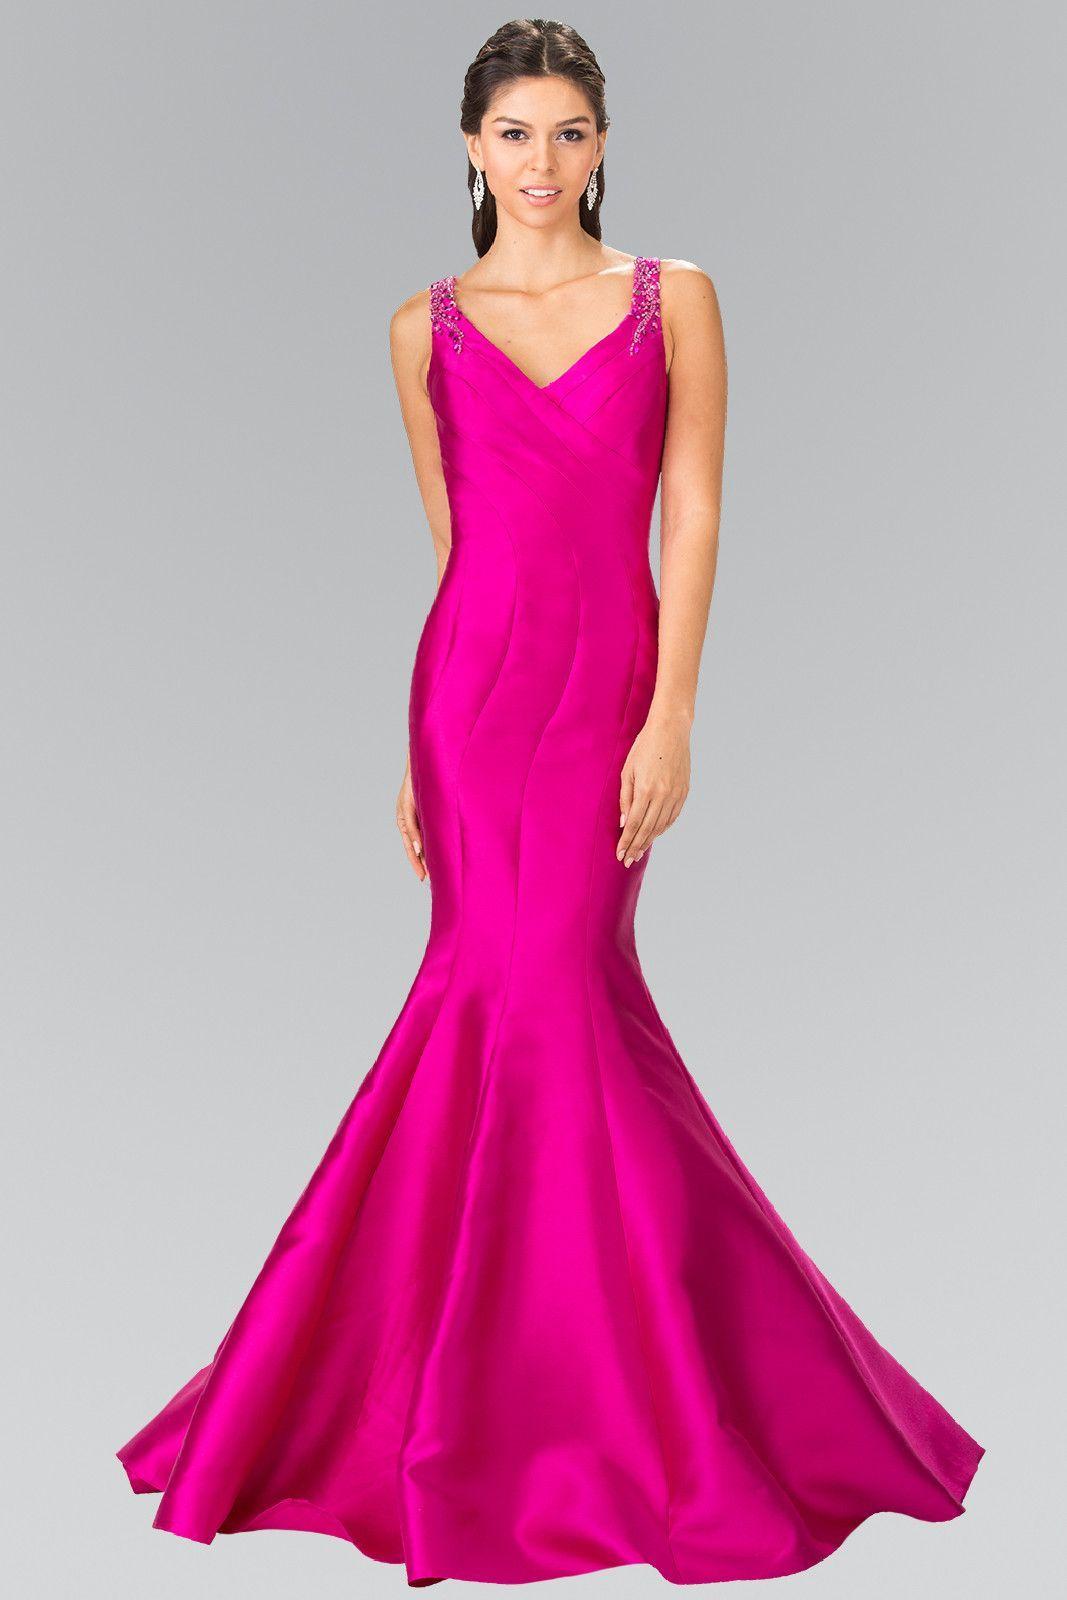 9d83f27e98a3a Mikado Beaded Runway Mermaid Prom Dress Trumpet Evening Gown XS ...